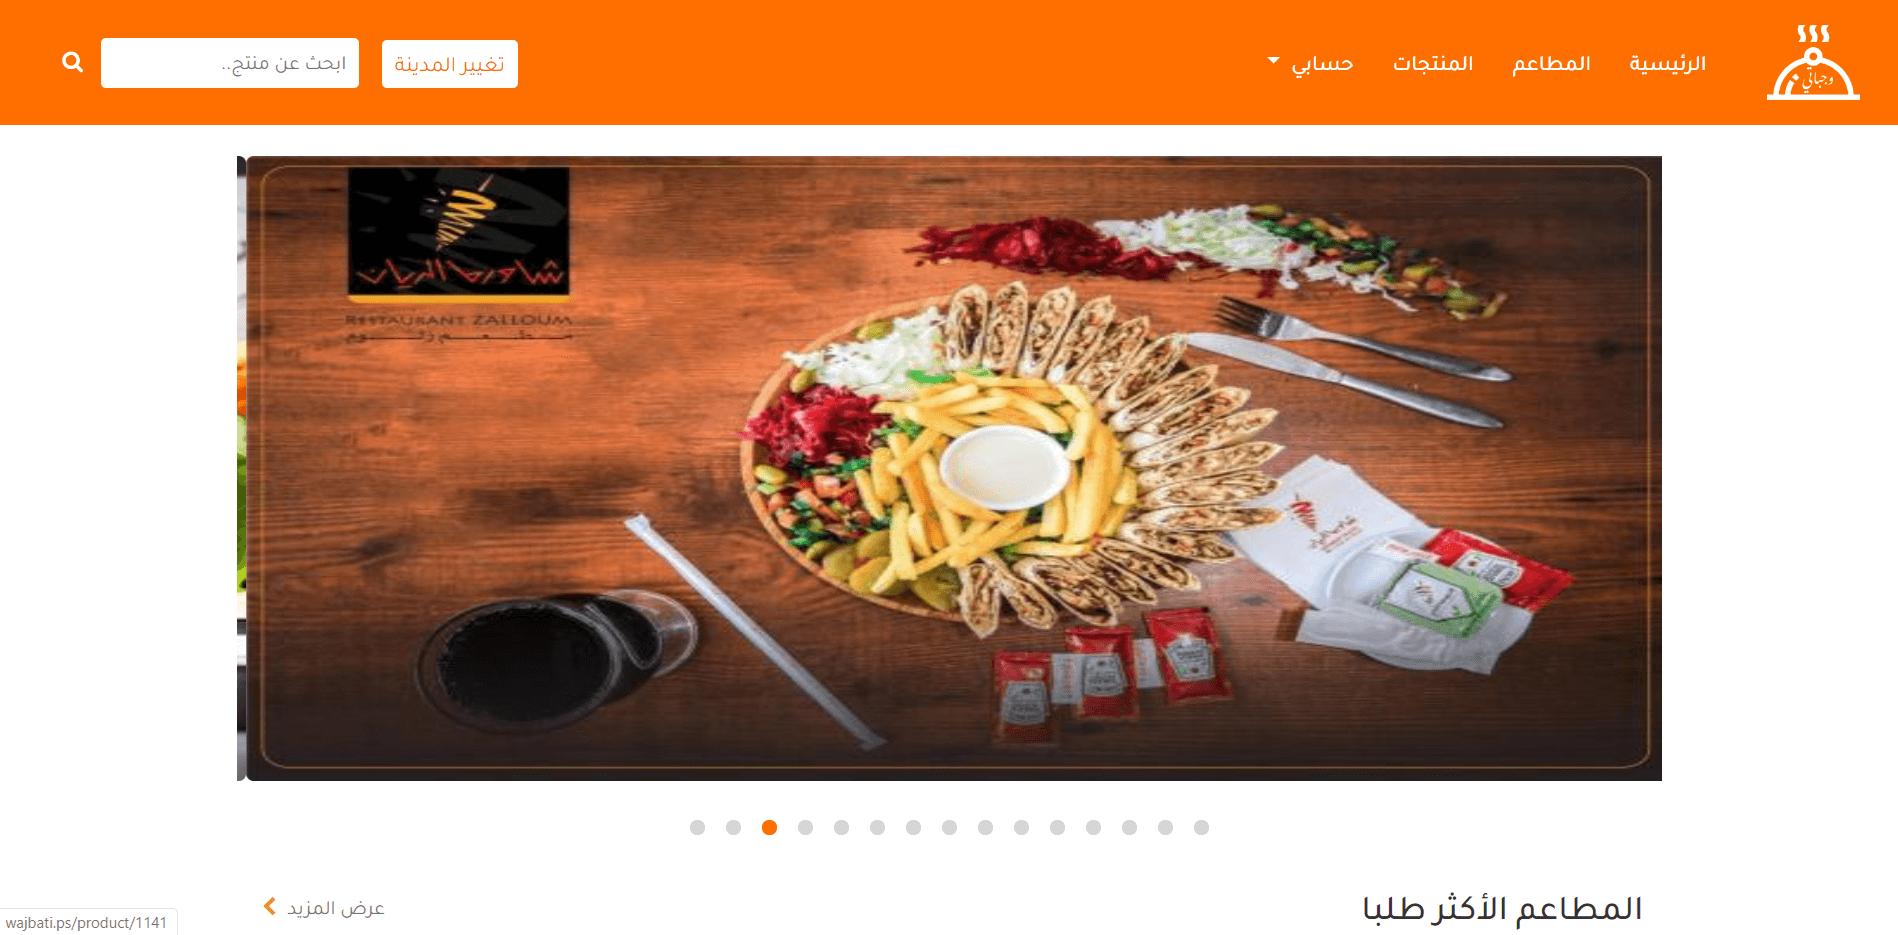 Wajbati | Order Food Online